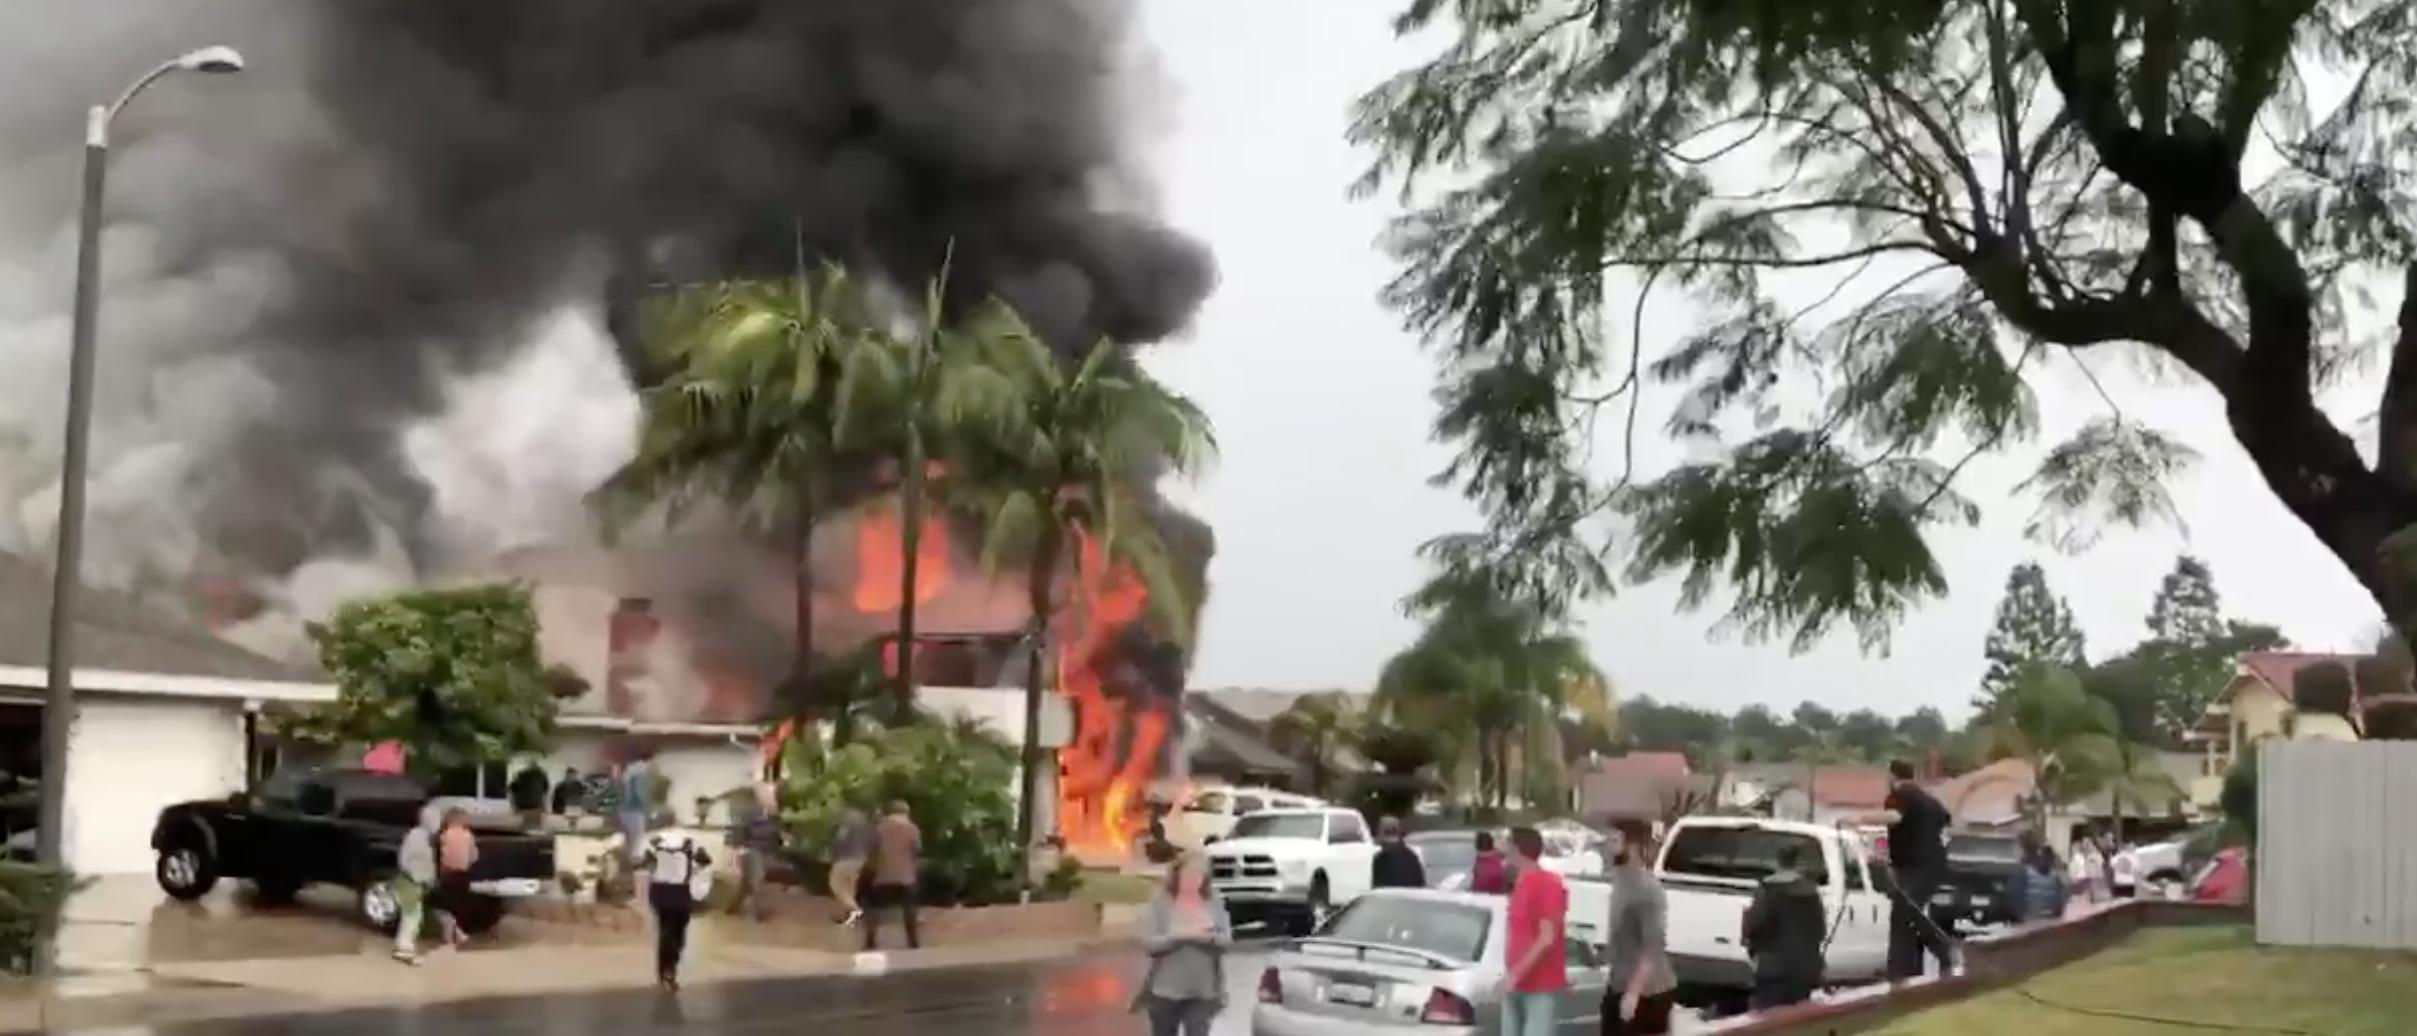 Yorba plane crash. Twitter screenshot/Joshua Nelson